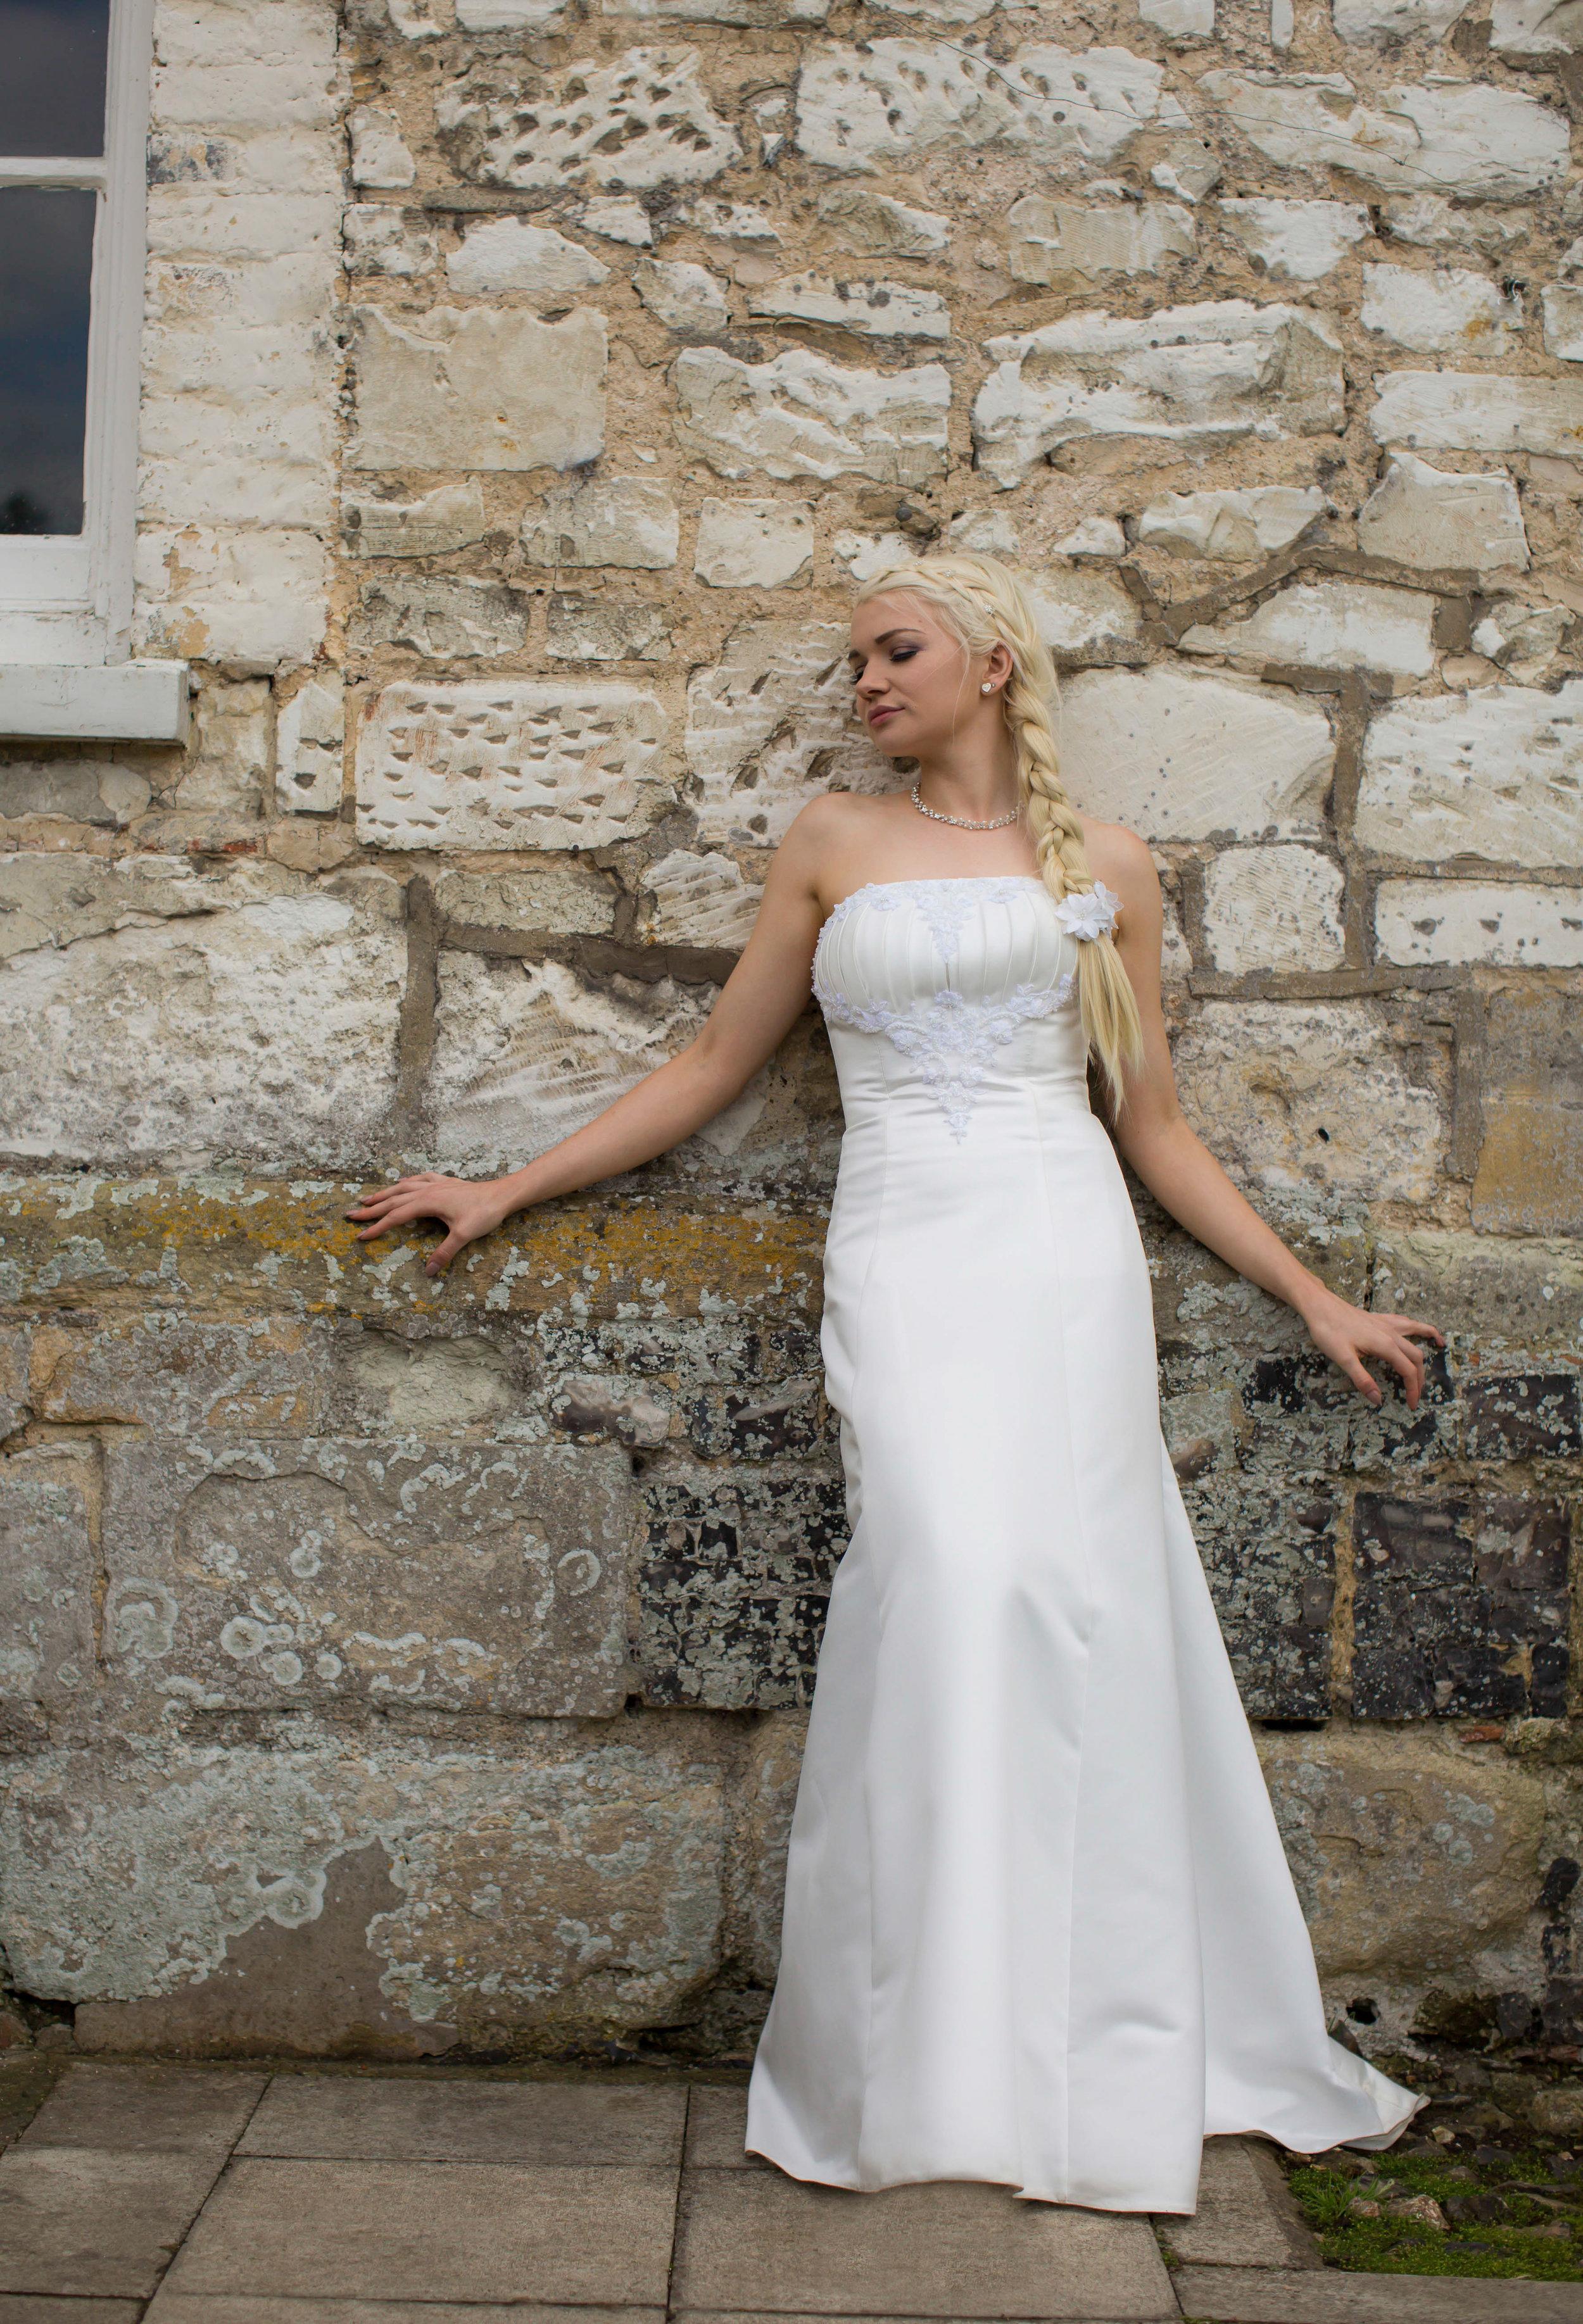 essex_wedding_photographer-20.jpg